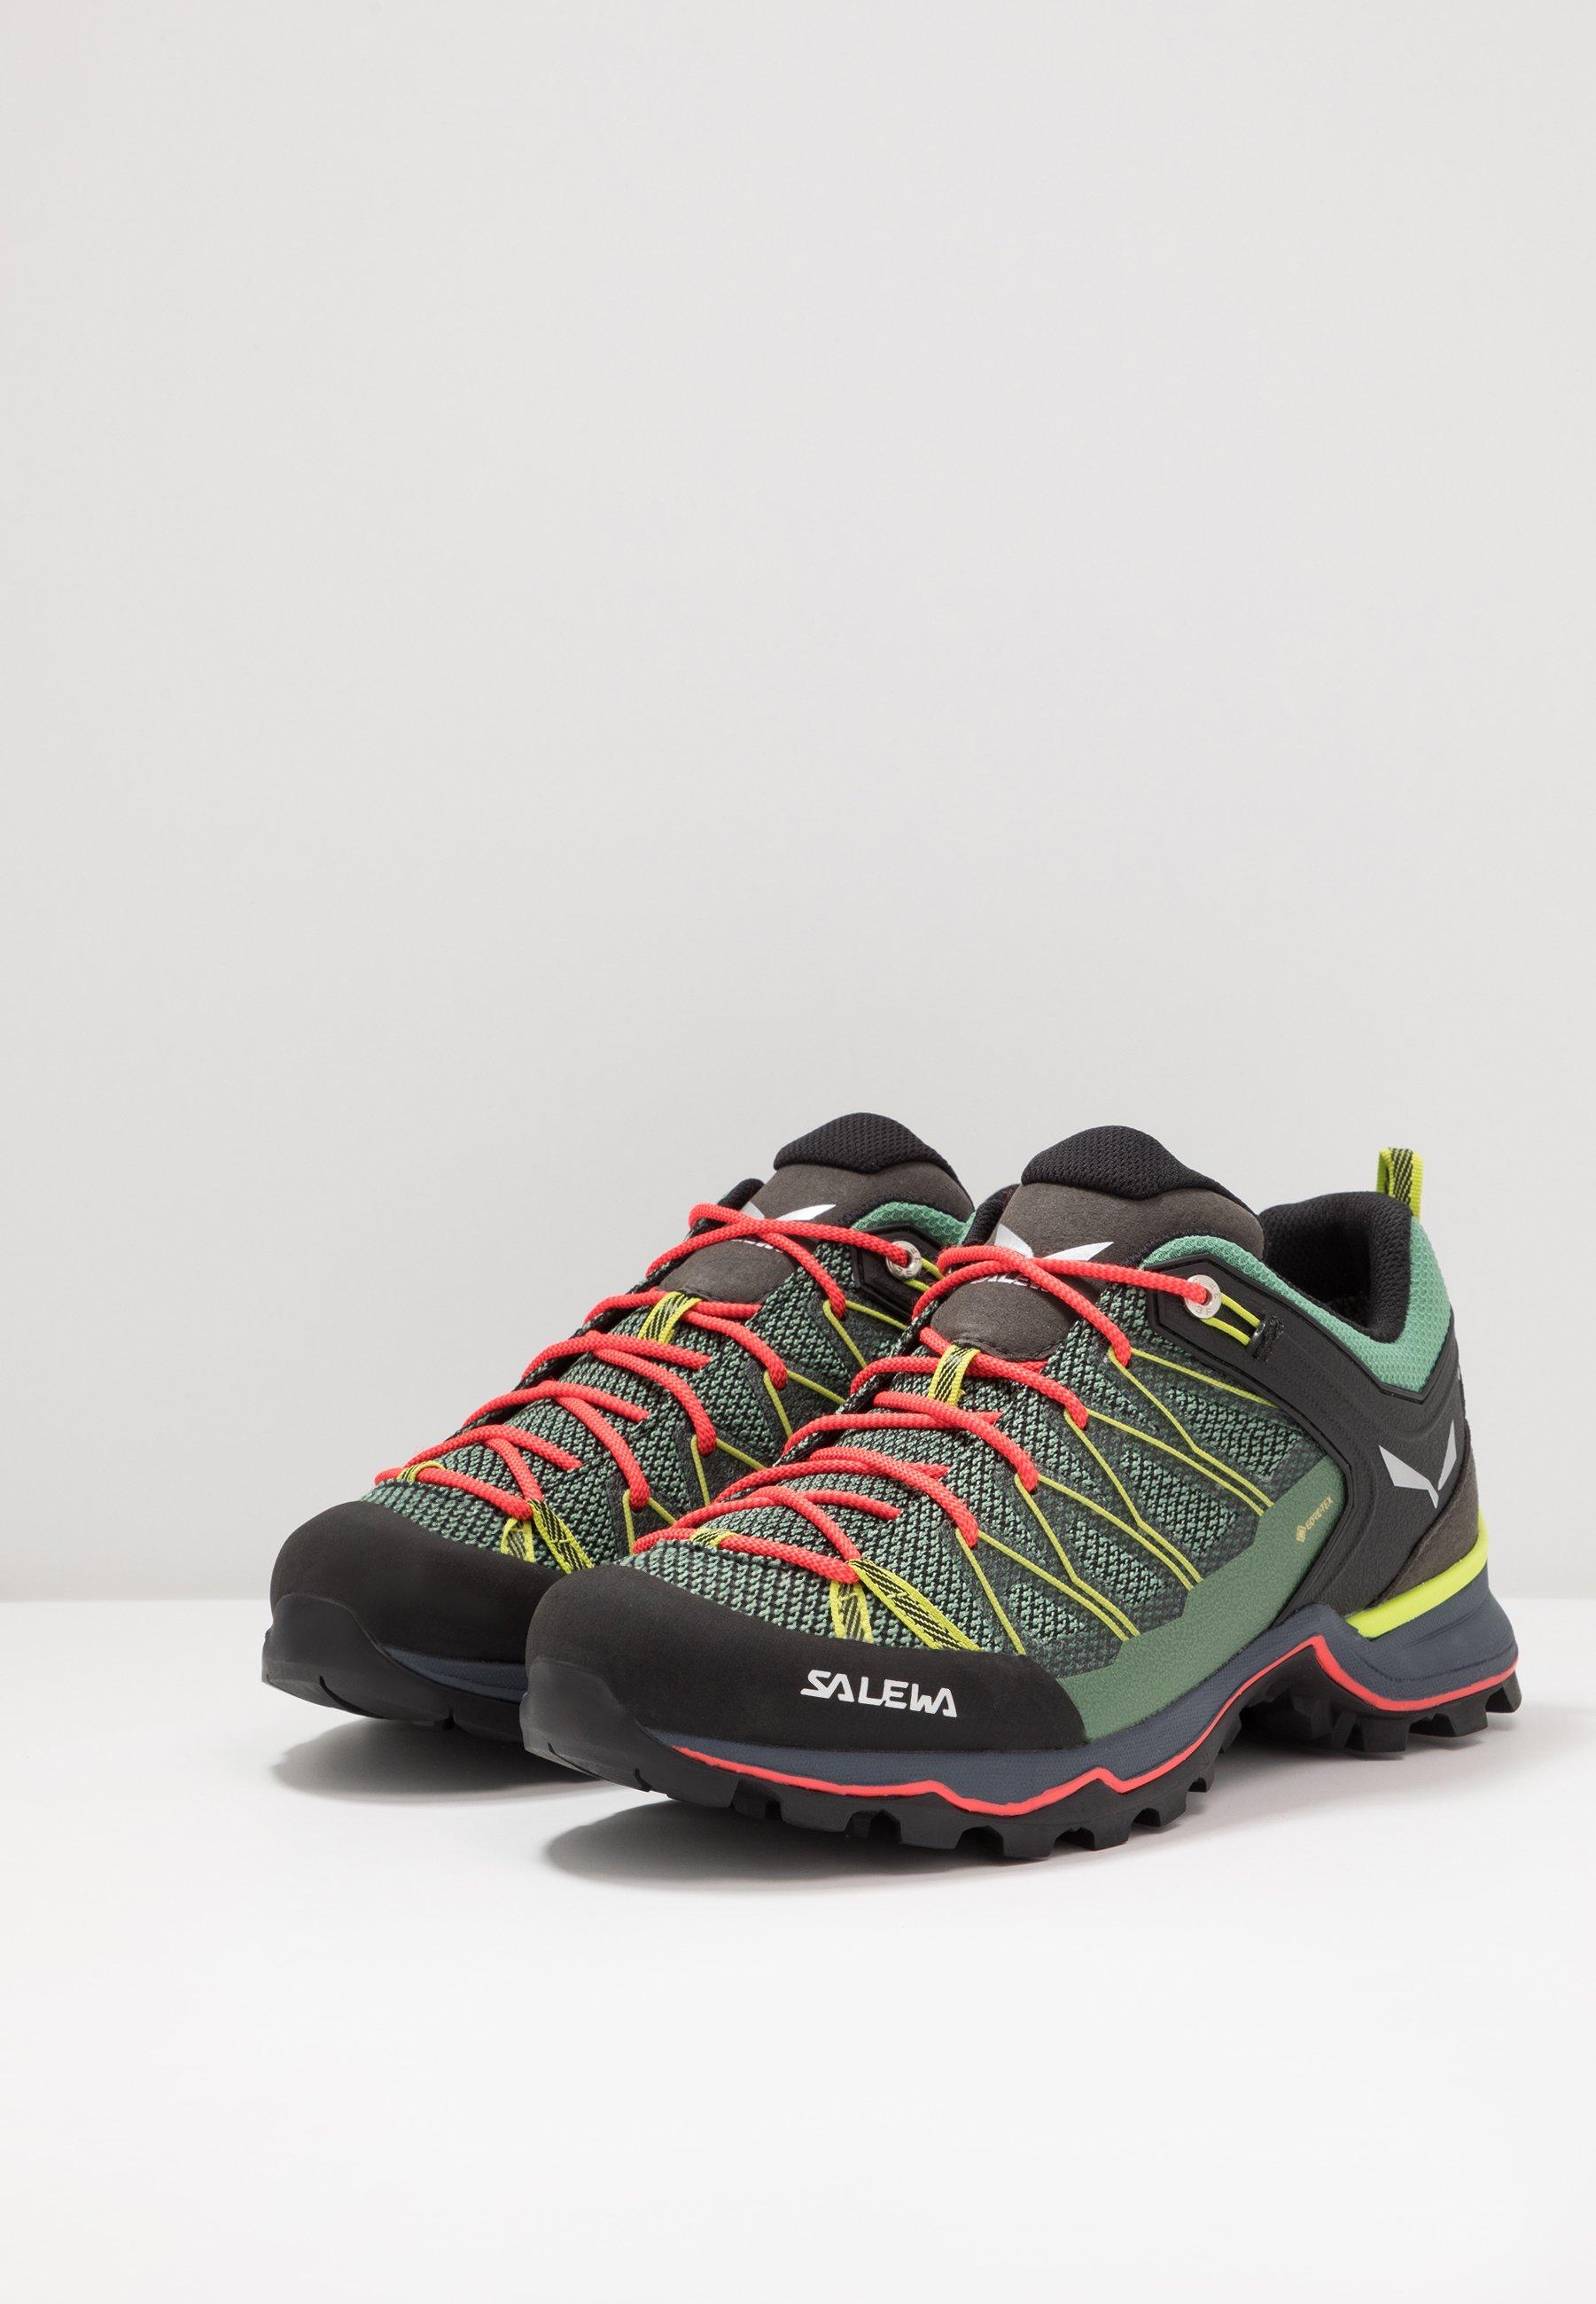 Salewa Mtn Trainer Lite Gtx - Chaussures De Marche Feld Green/fluo Coral